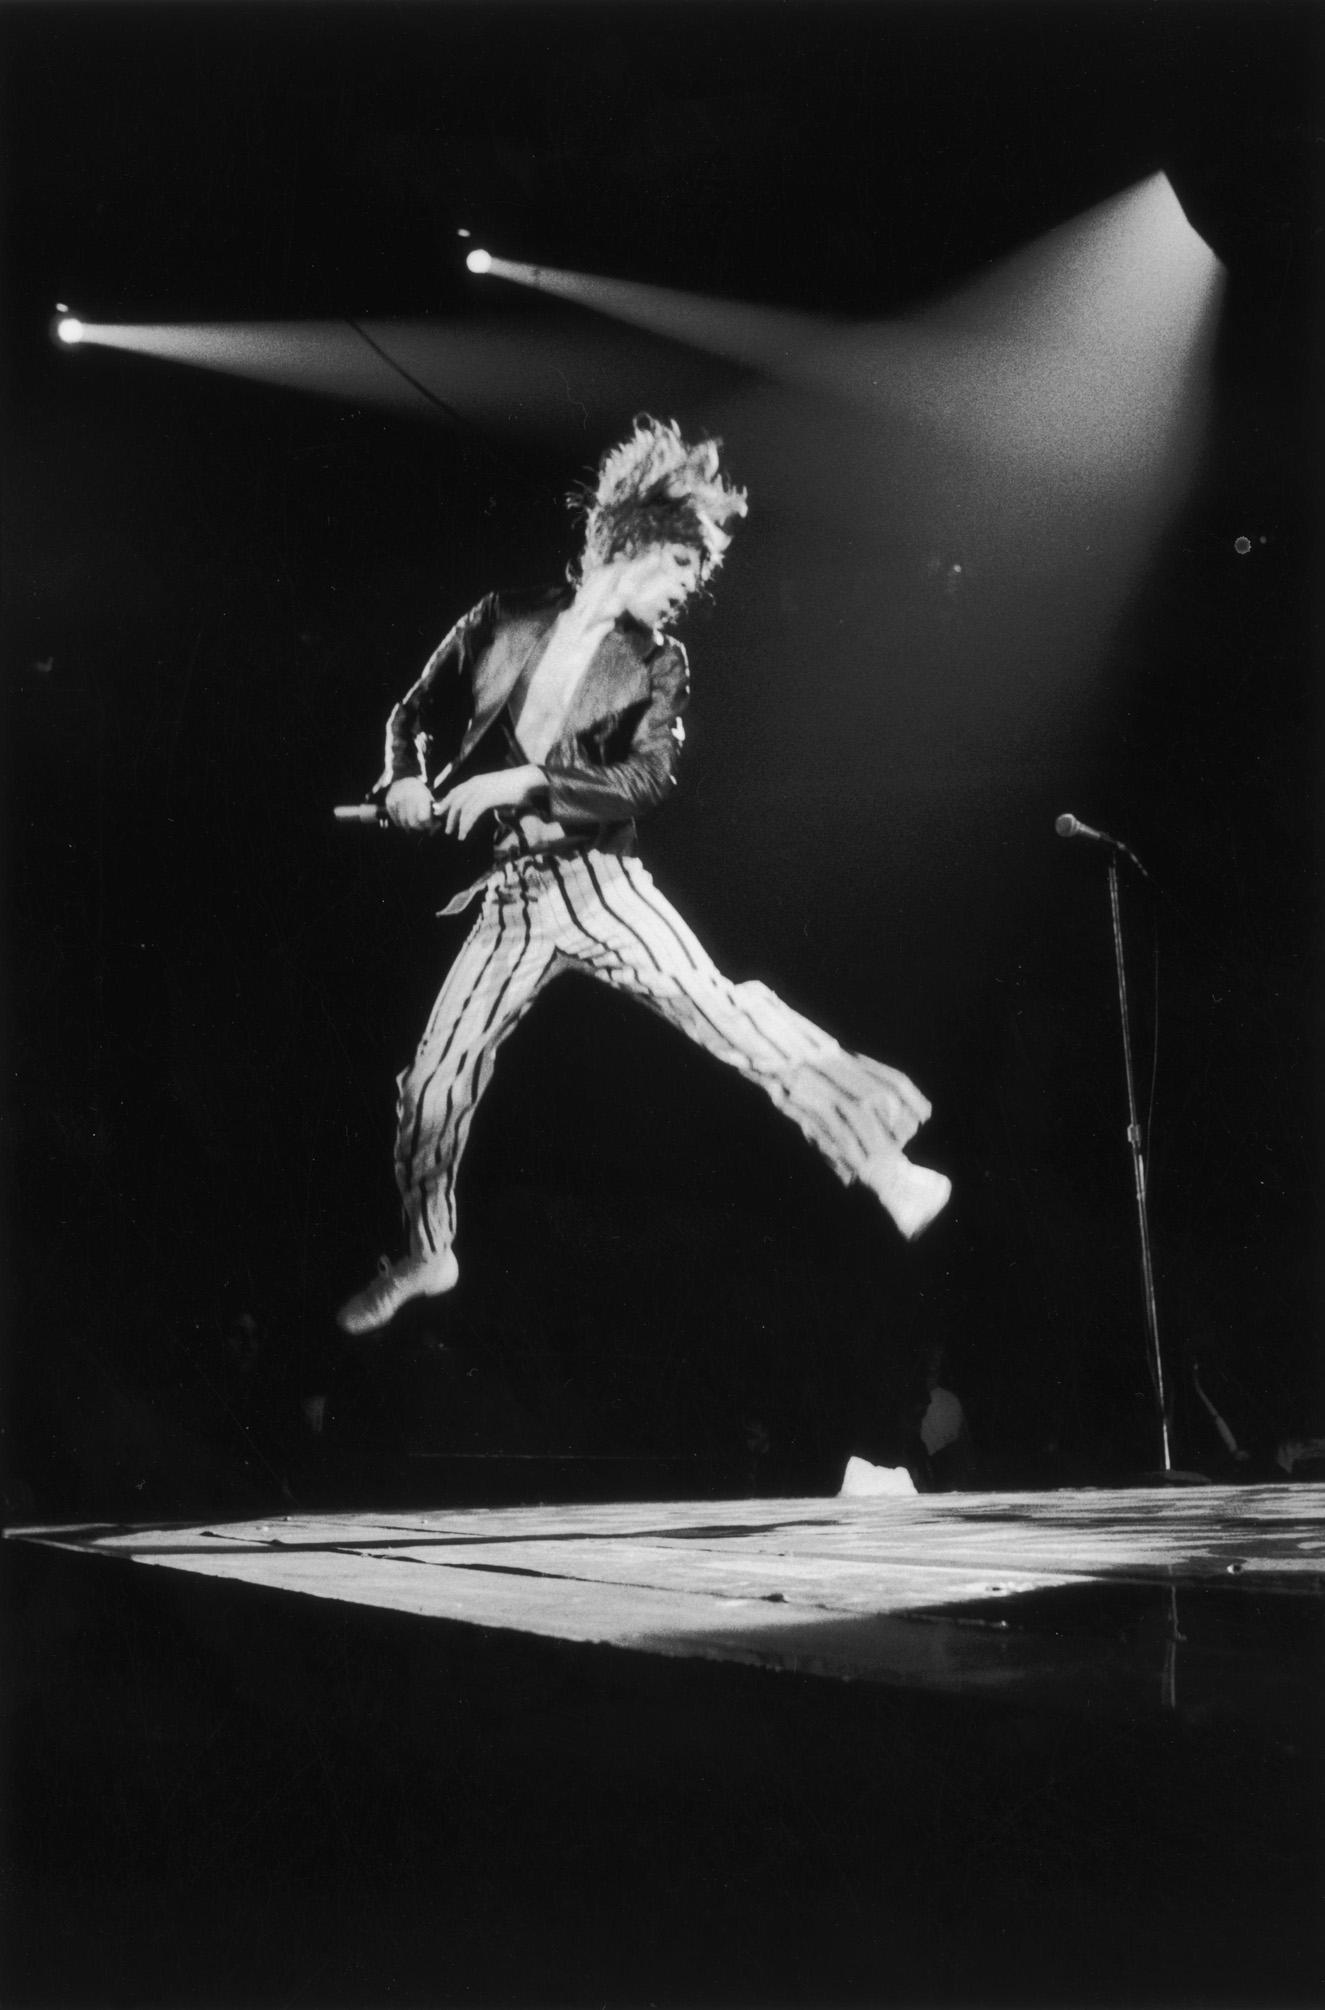 Jumping Jack Flash fine art photography